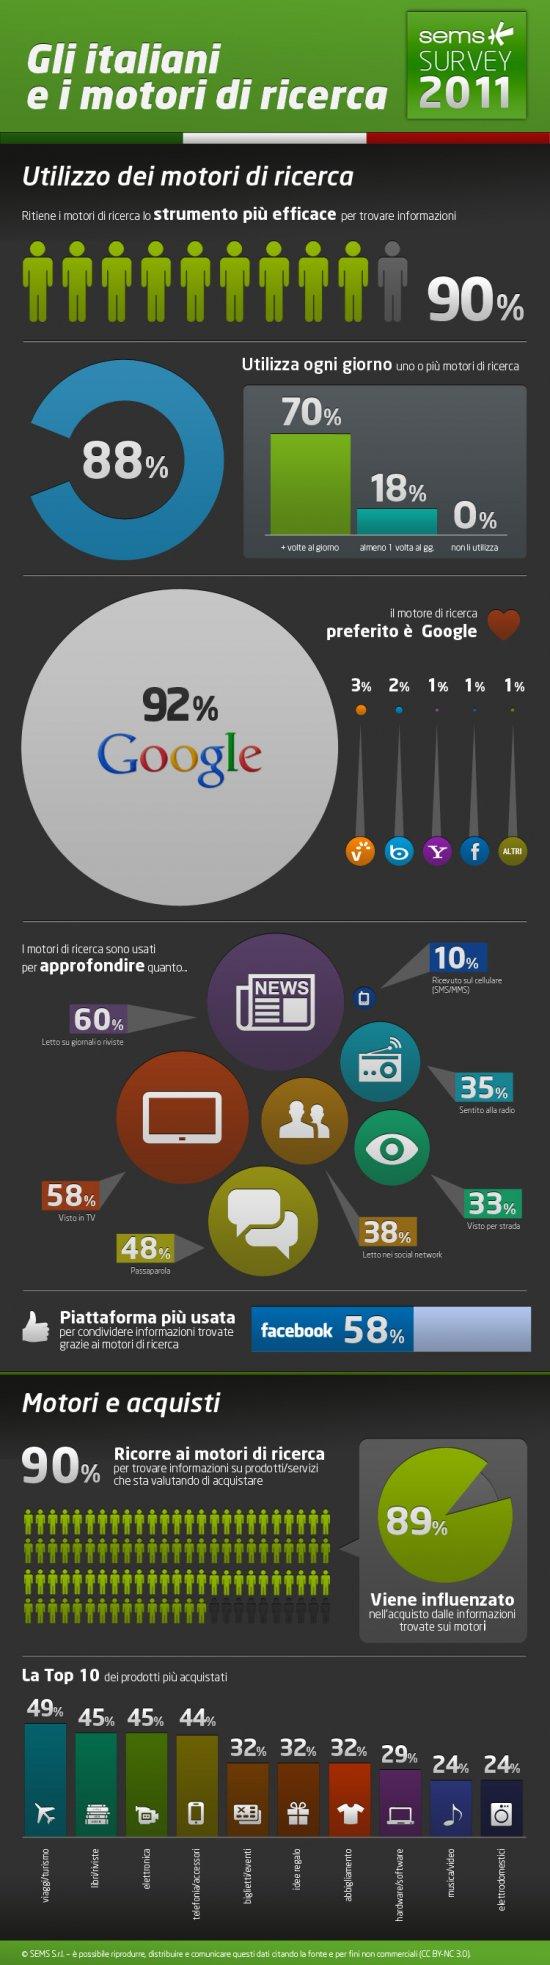 SEMS infografica motori ricerca 2011